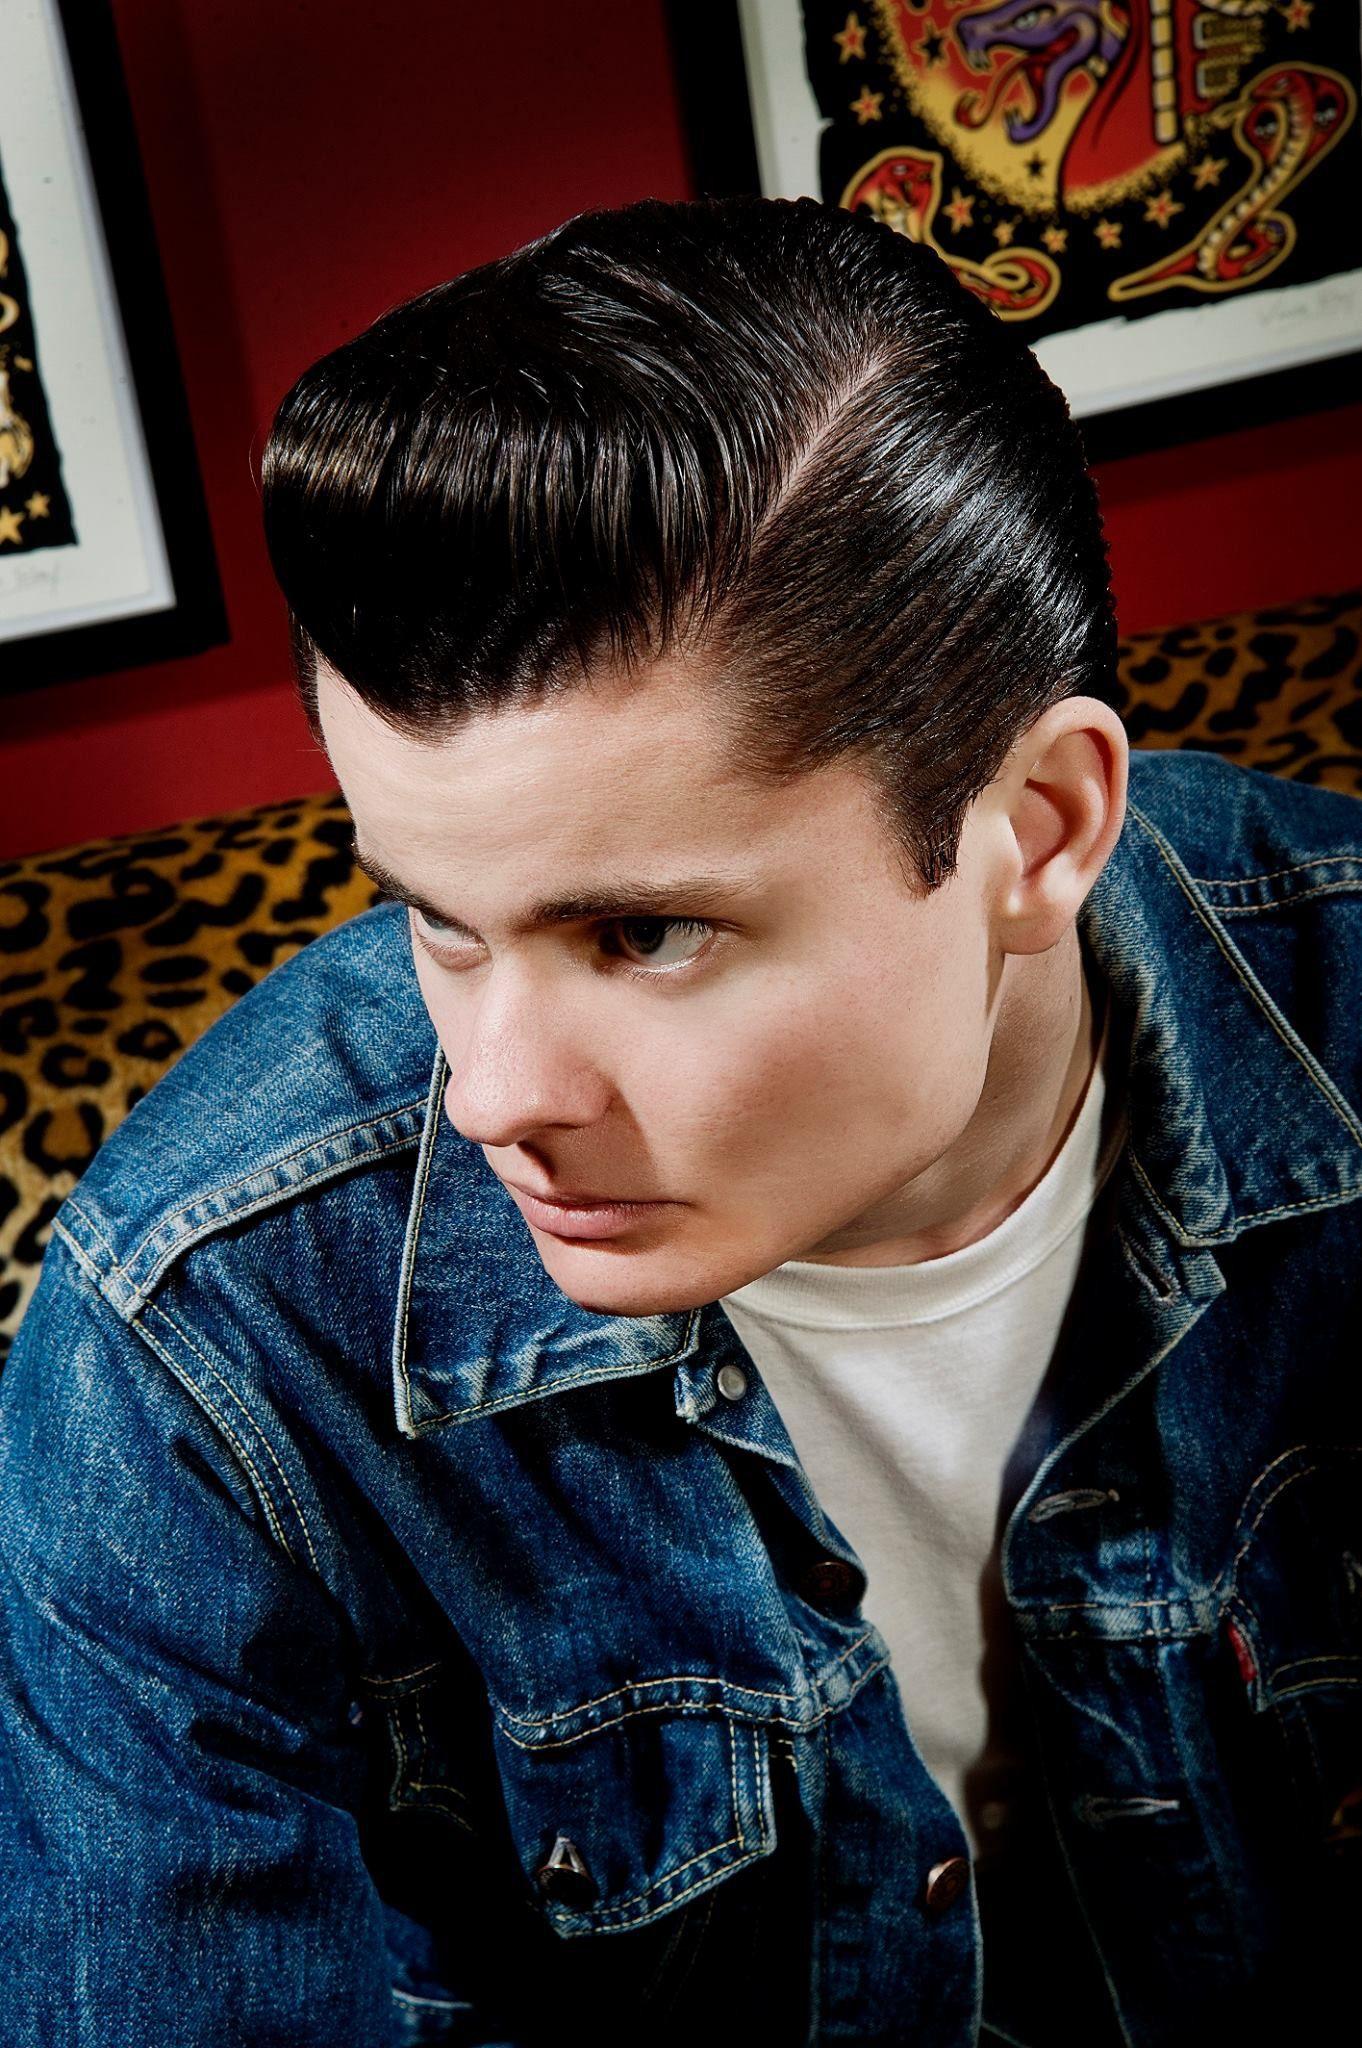 Rockabilly Men Hairstyle Fade Haircut